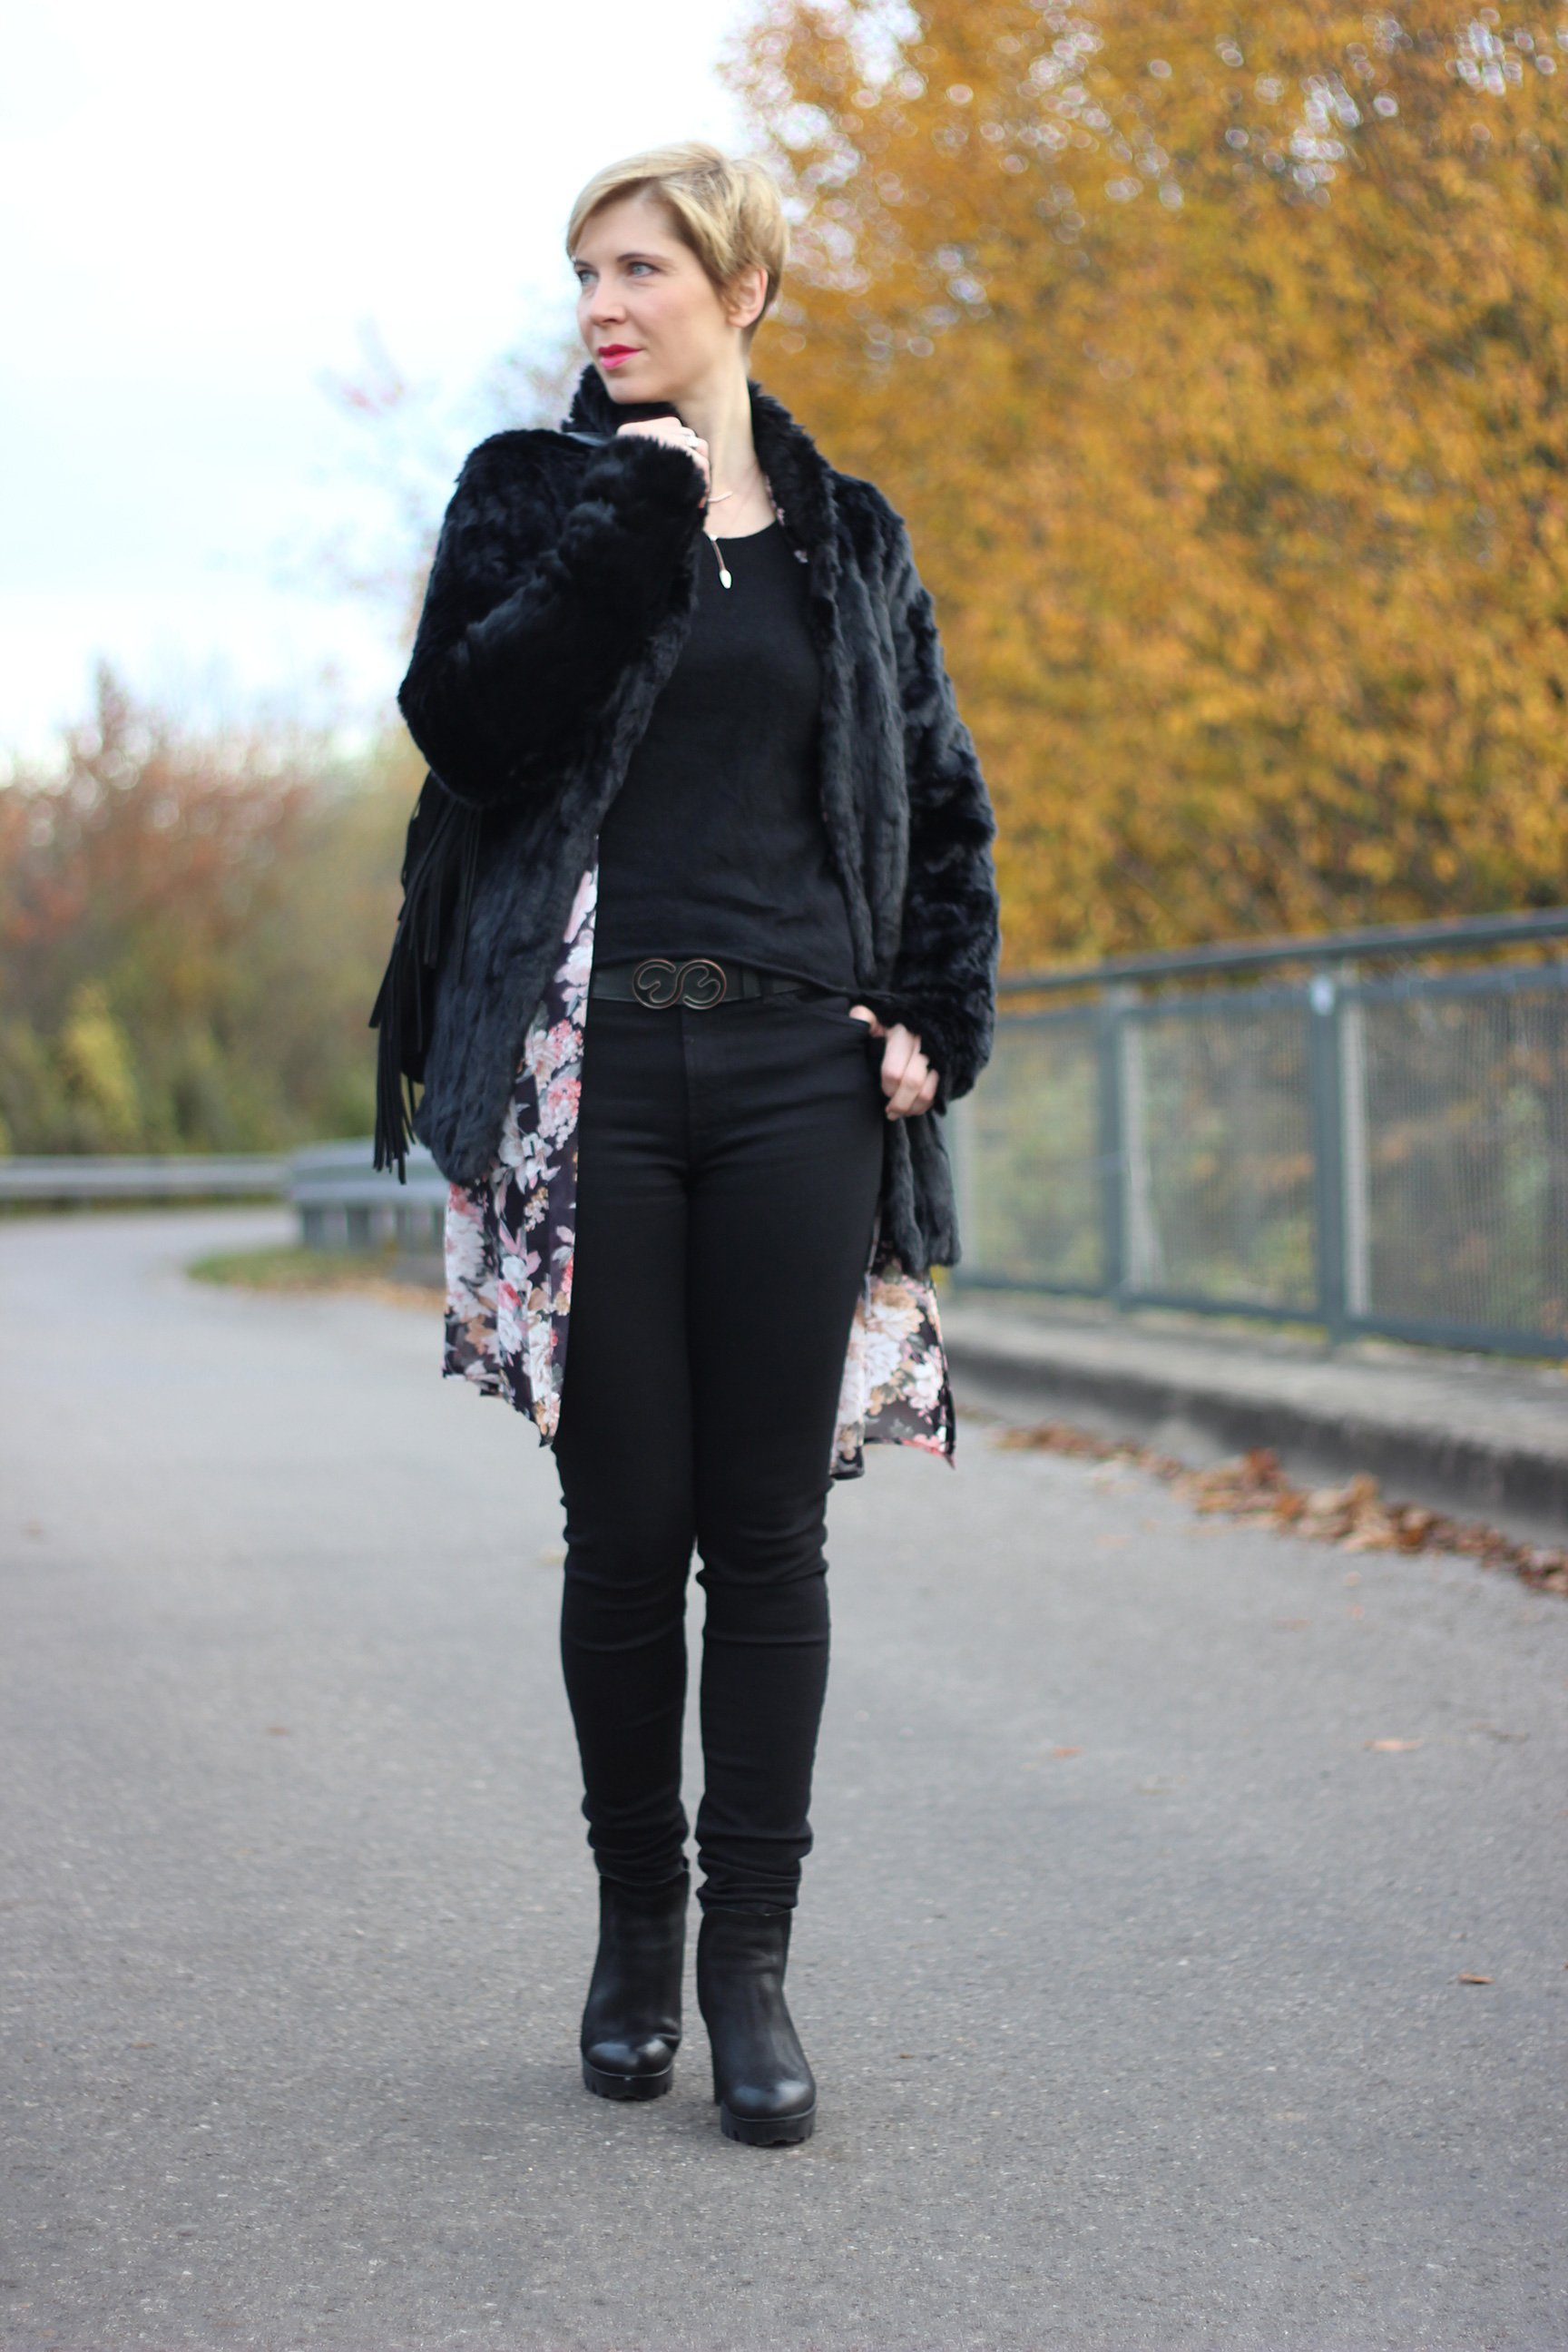 IMG_6759a_Only_Flowers_Longblouse_Felmini_Ankleboots_ConnyDoll_7forallmankind